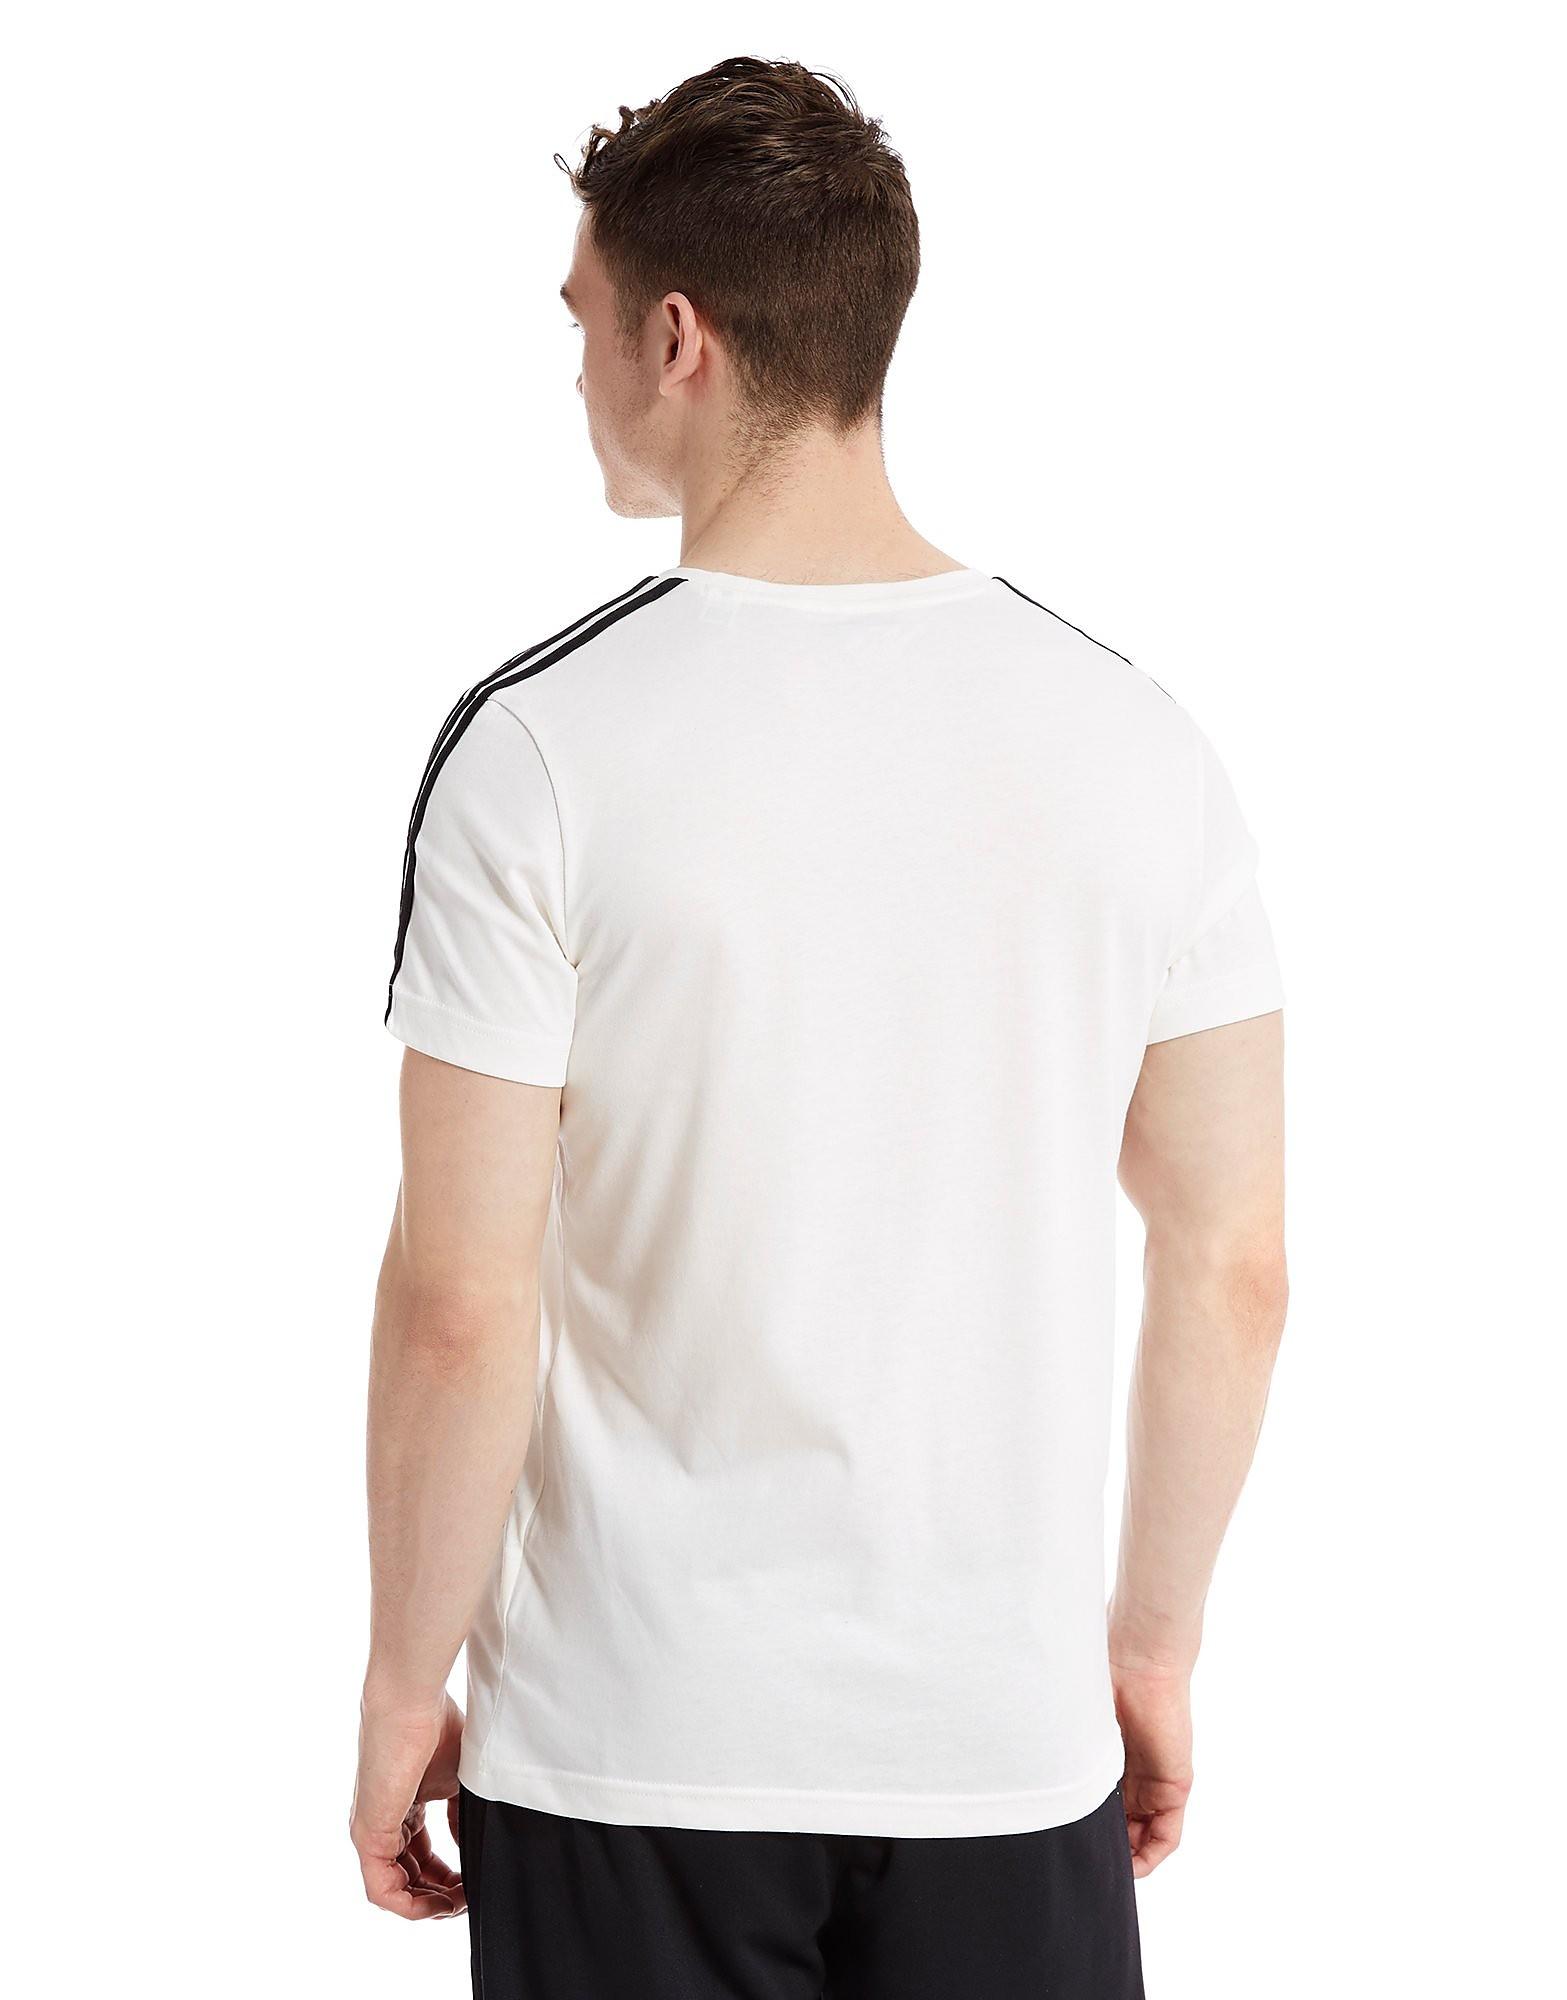 adidas Euro 2016 Germany Graphic T-Shirt